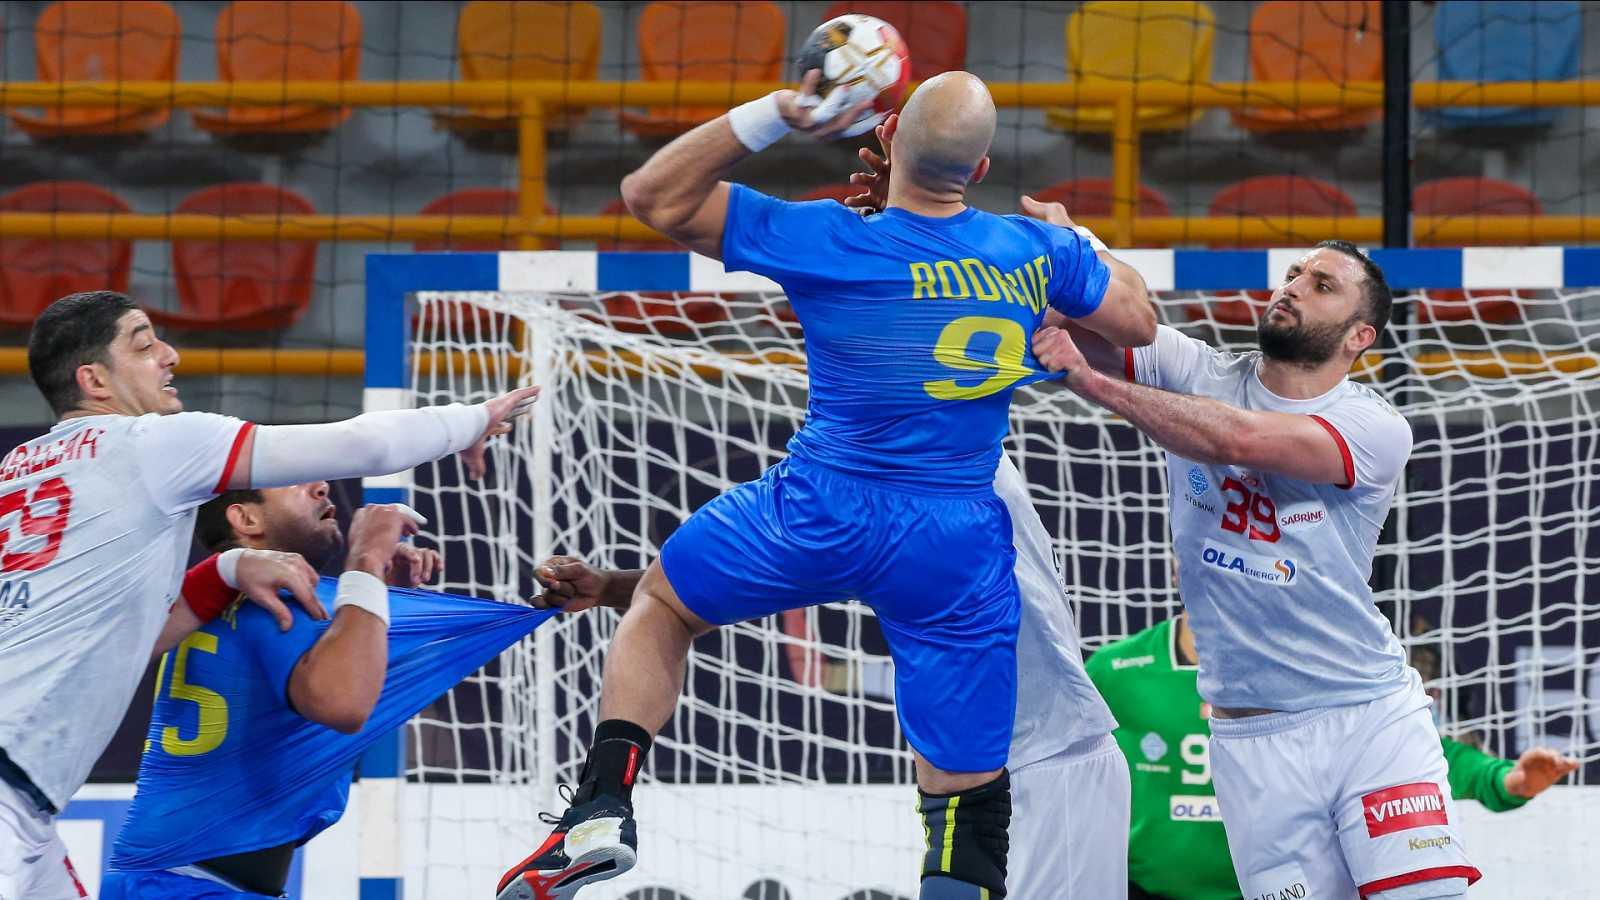 Balonmano - Campeonato del Mundo masculino: Túnez - Brasil - ver ahora